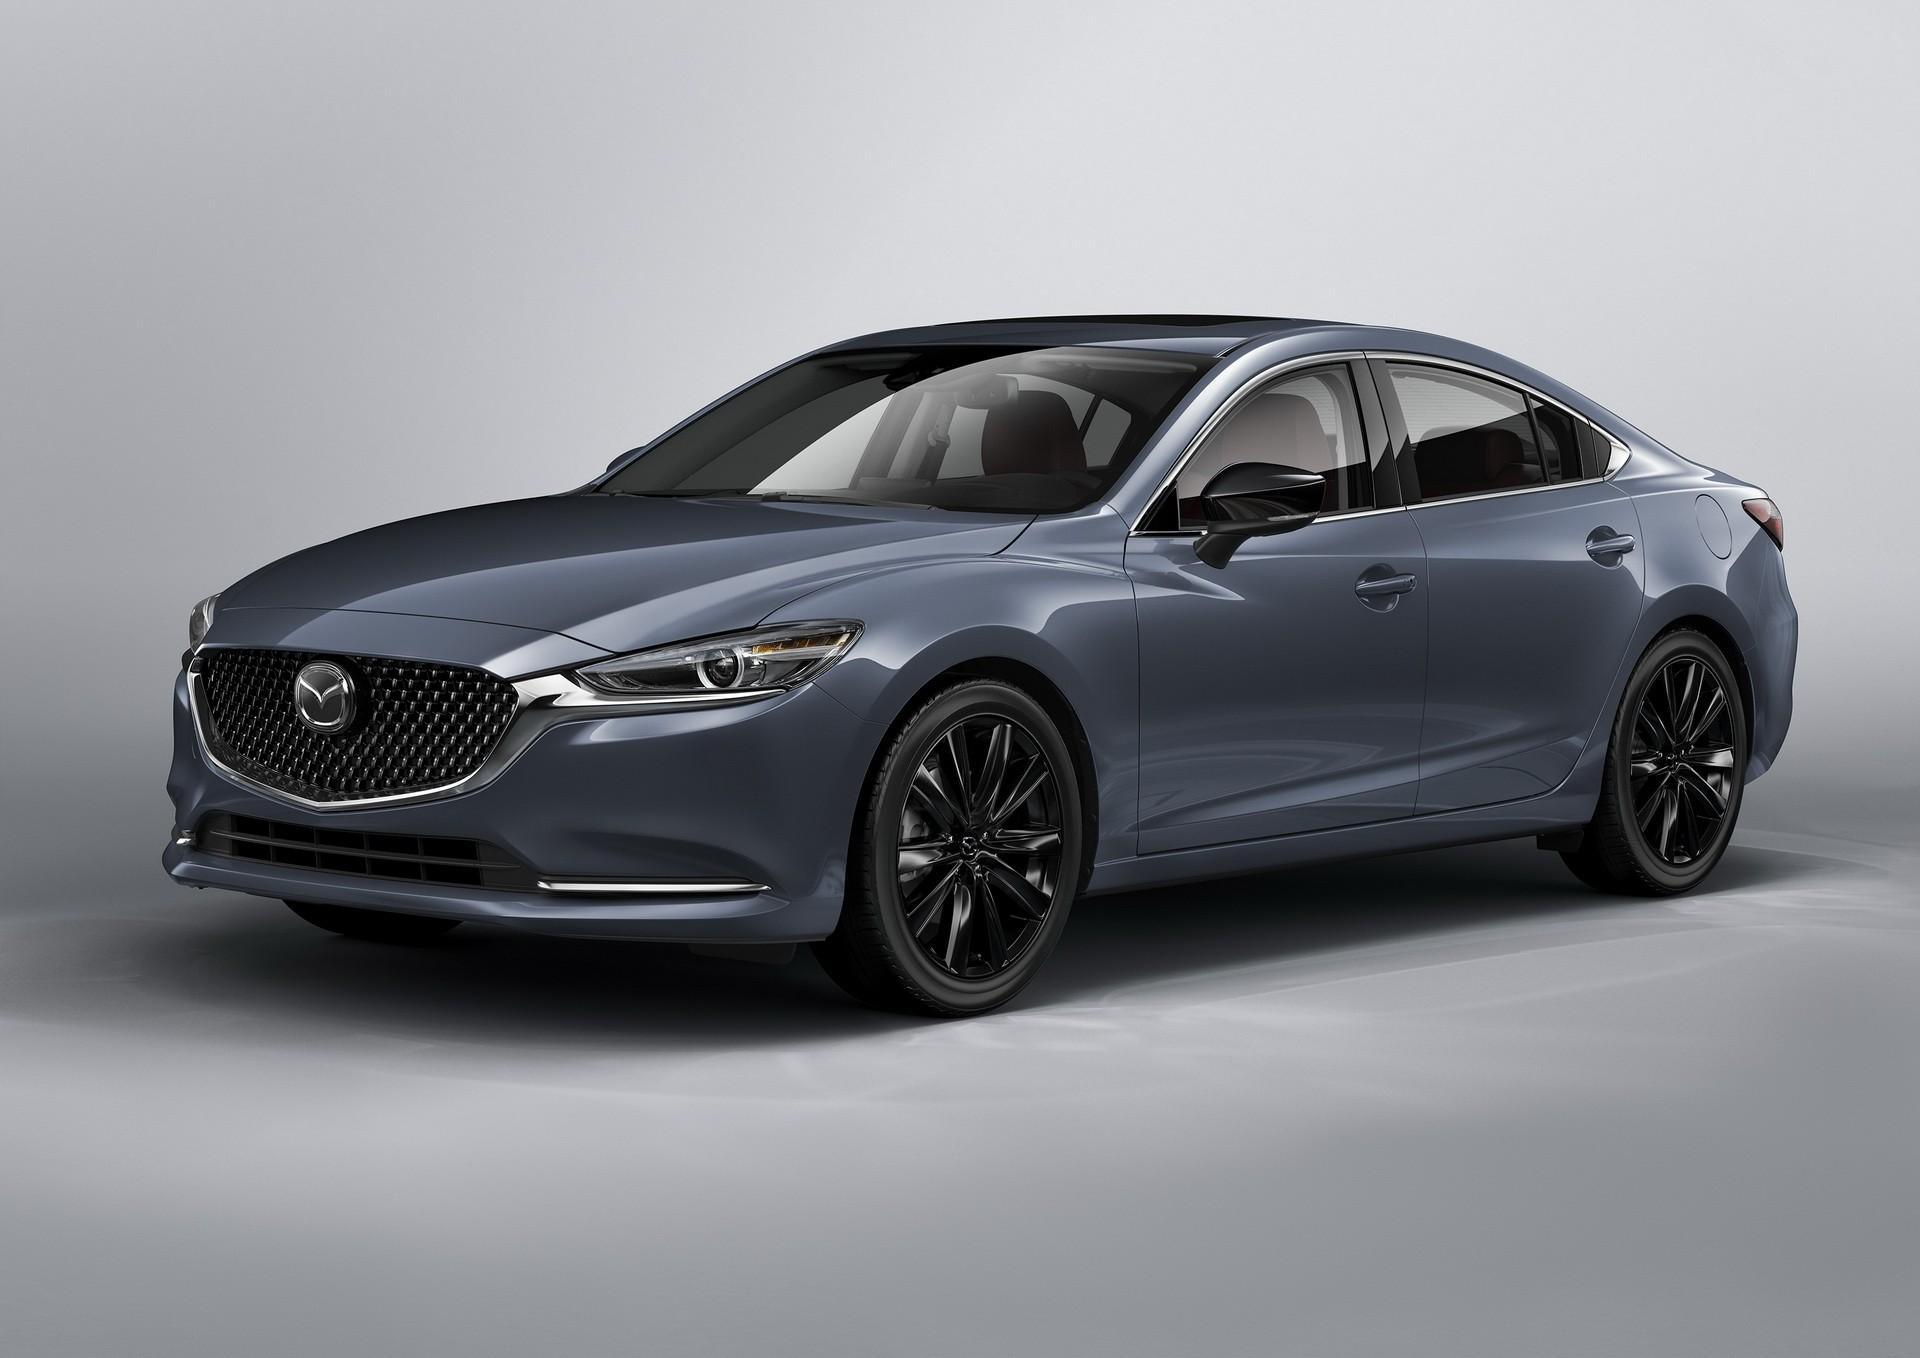 Bảng giá xe Mazda 6 2021